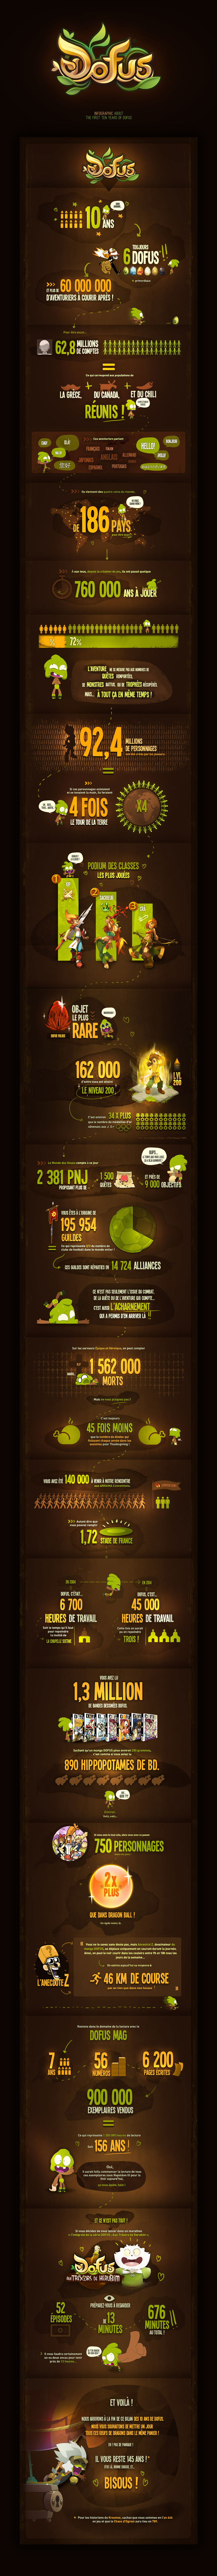 Infographie Infographic Dofus Flouk Floriane Dupont Graphic Designer Freelance Basee A Lille Digital Print